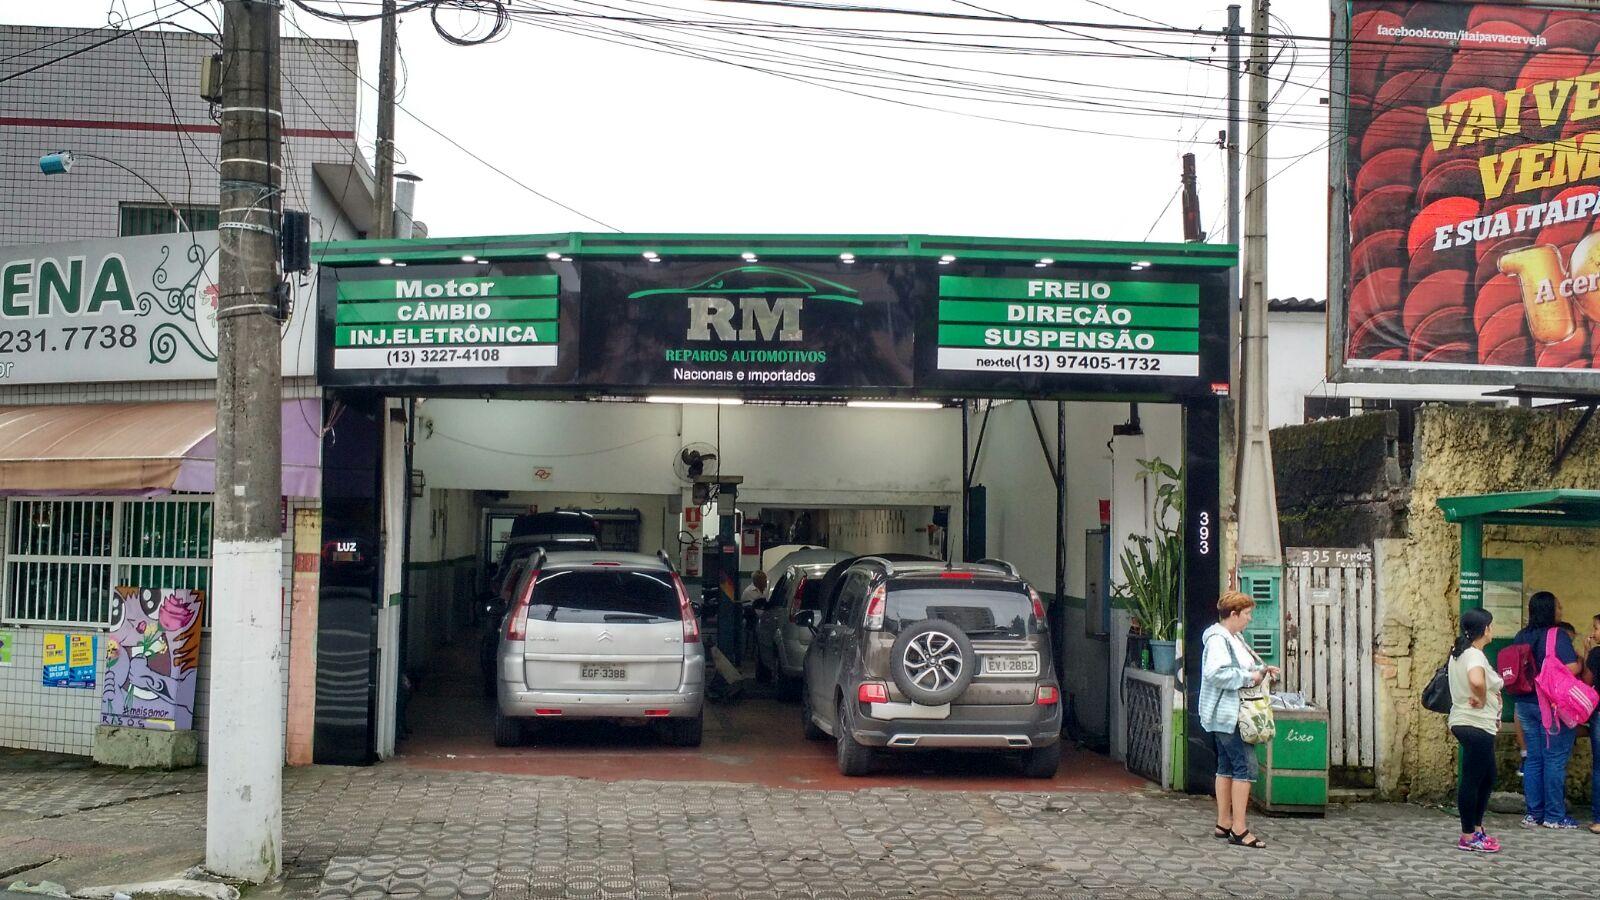 RM Rep.Automotivos,Santos S.Paulo